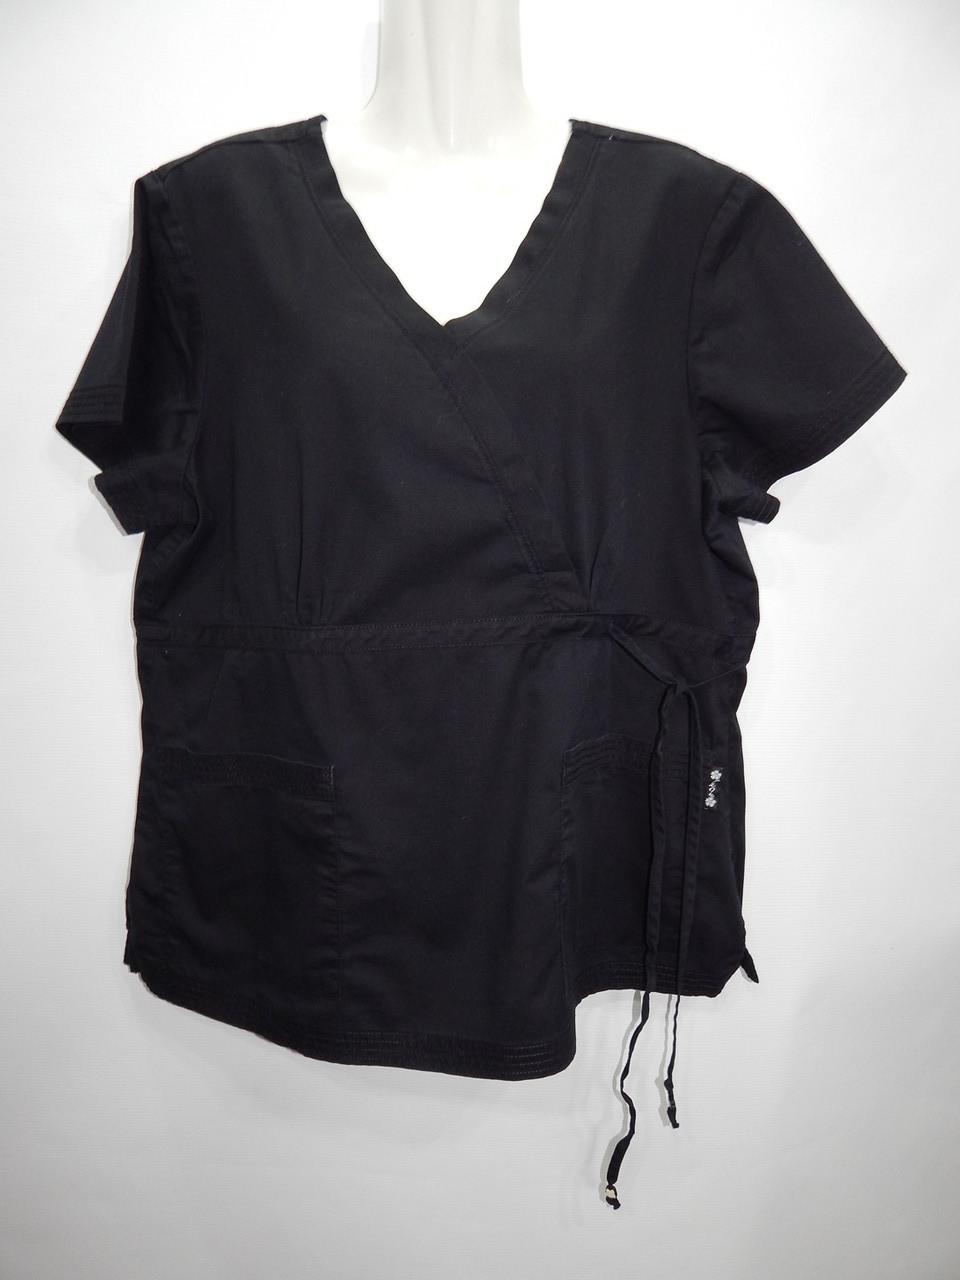 Женская блуза рабочая р. 50-52  002GRO